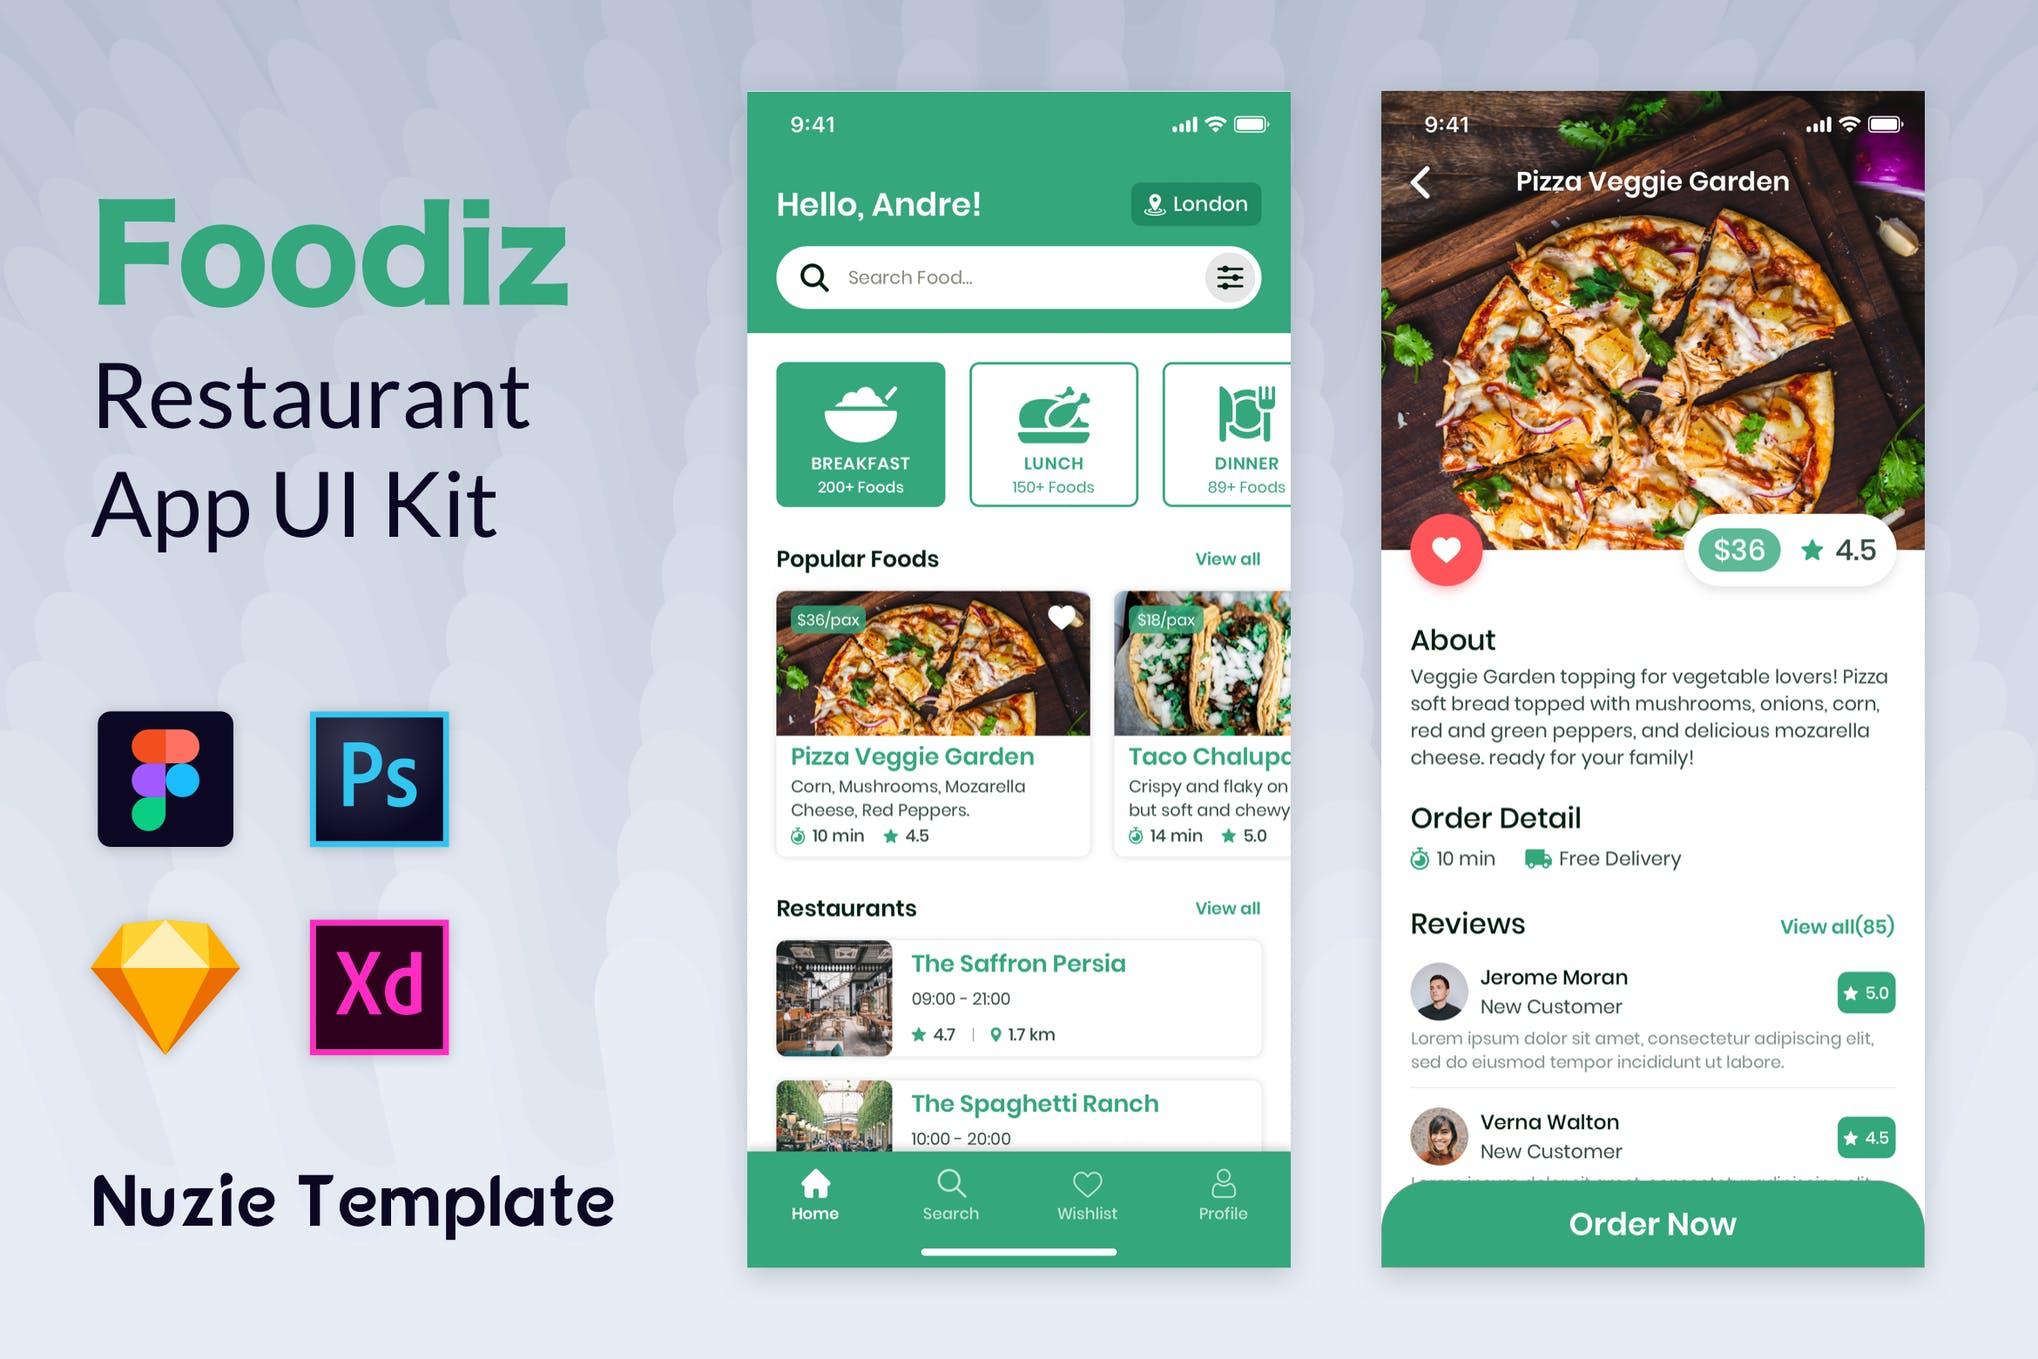 Nuzie-食品应用模板 ui模板素材下载